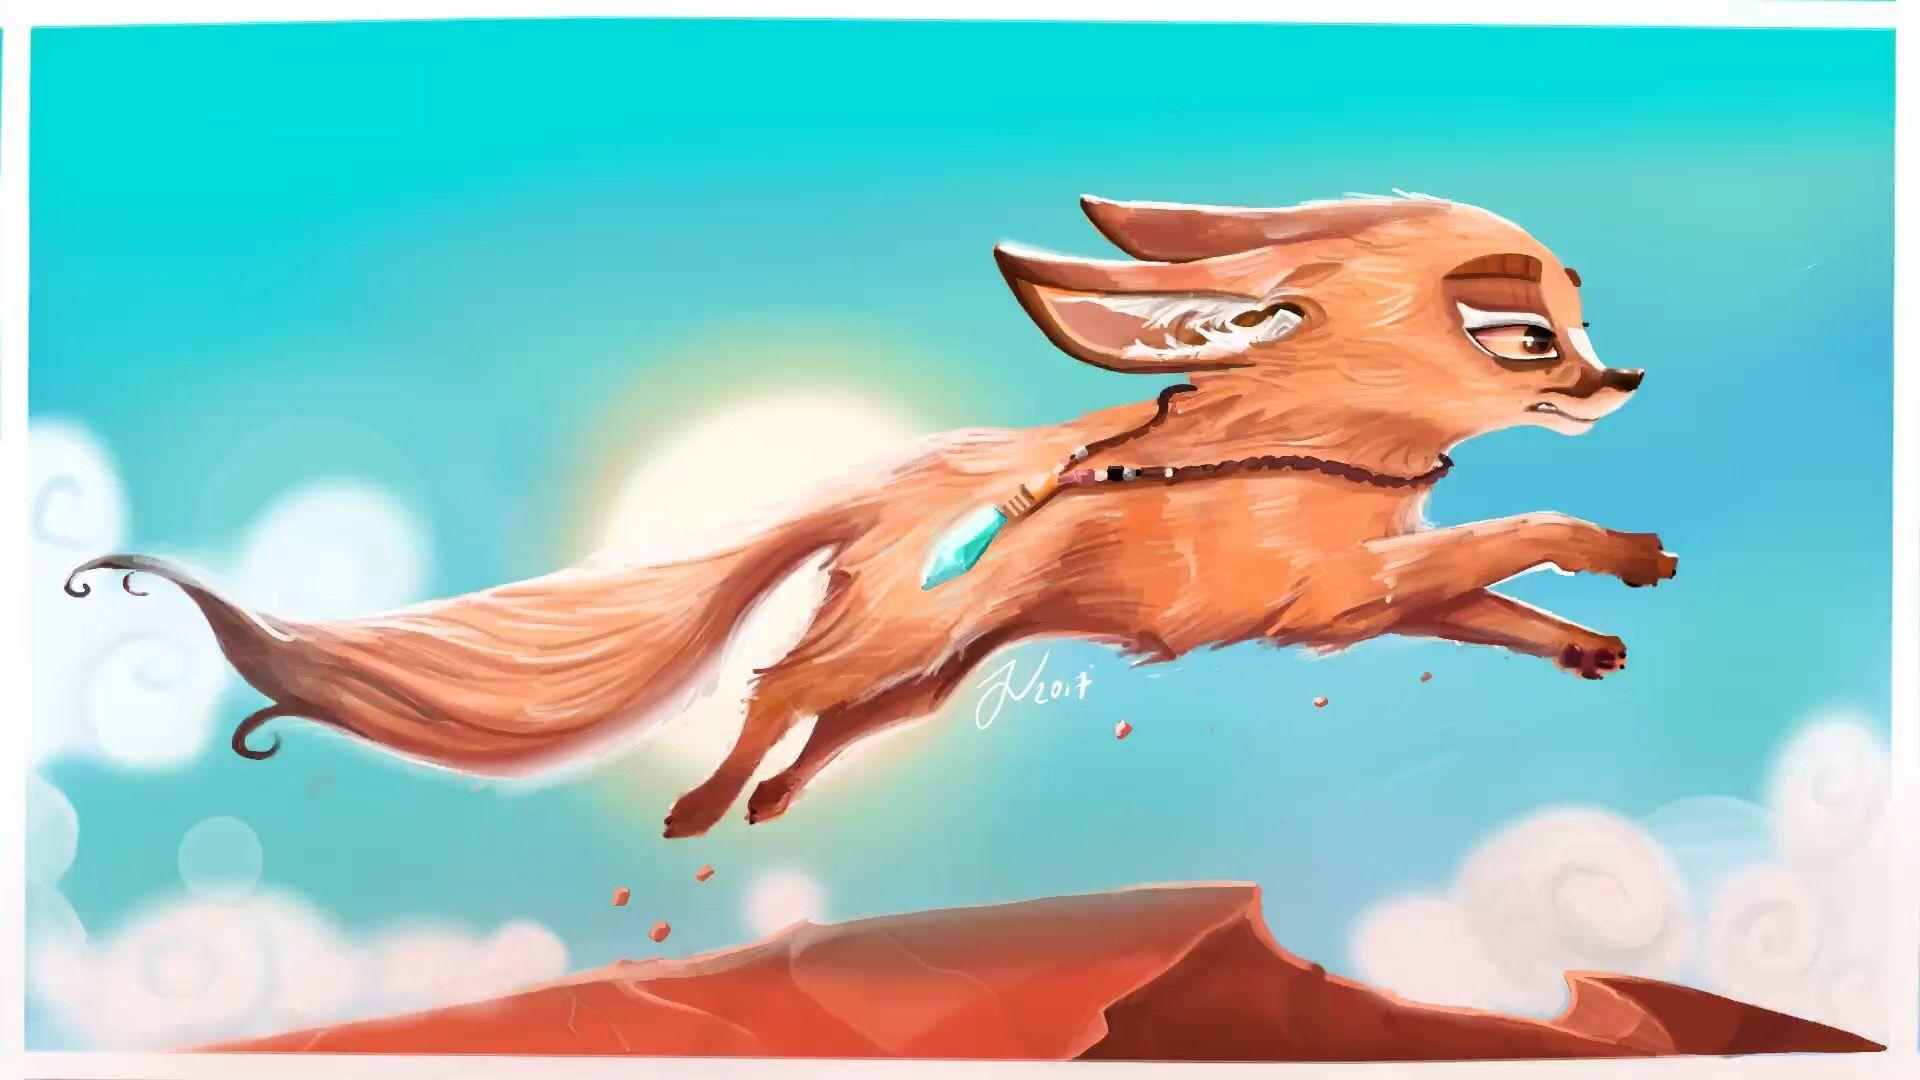 Fennec fox running in hot desert sun. #fennec #fox #procreate #art #digital #desert #sun